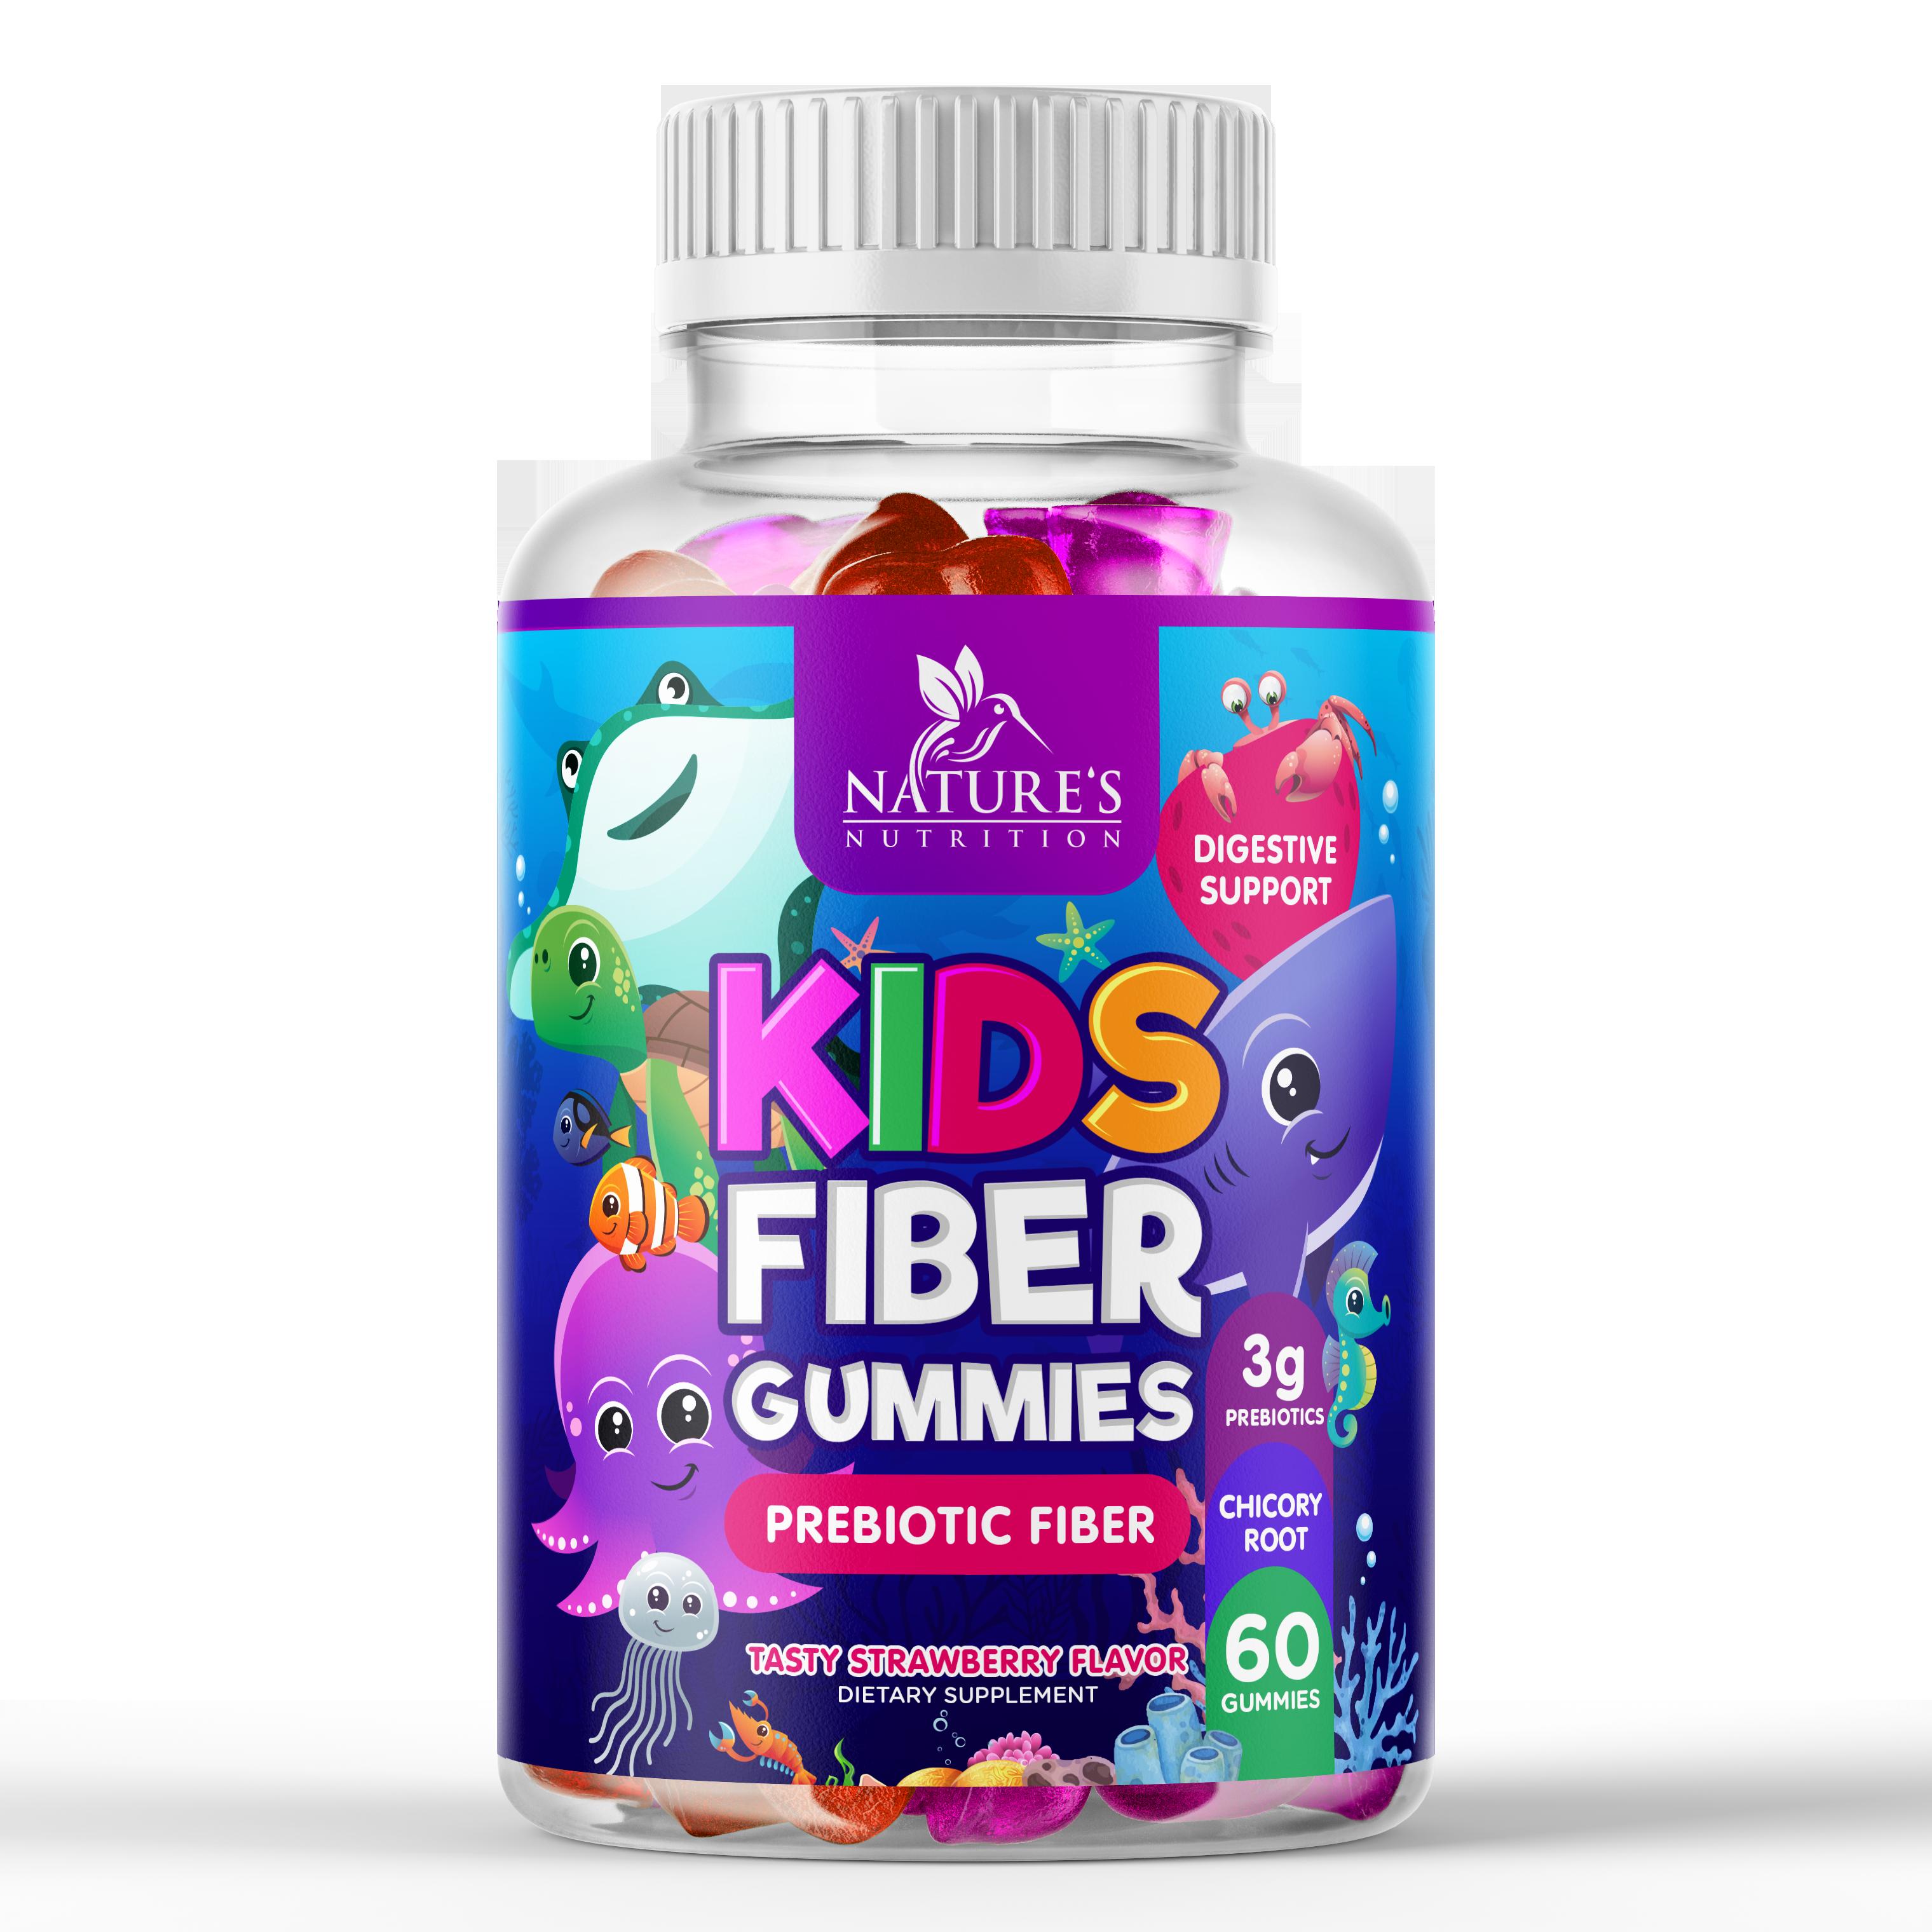 Cute Kids Fiber Gummies Design needed for Nature's Nutrition